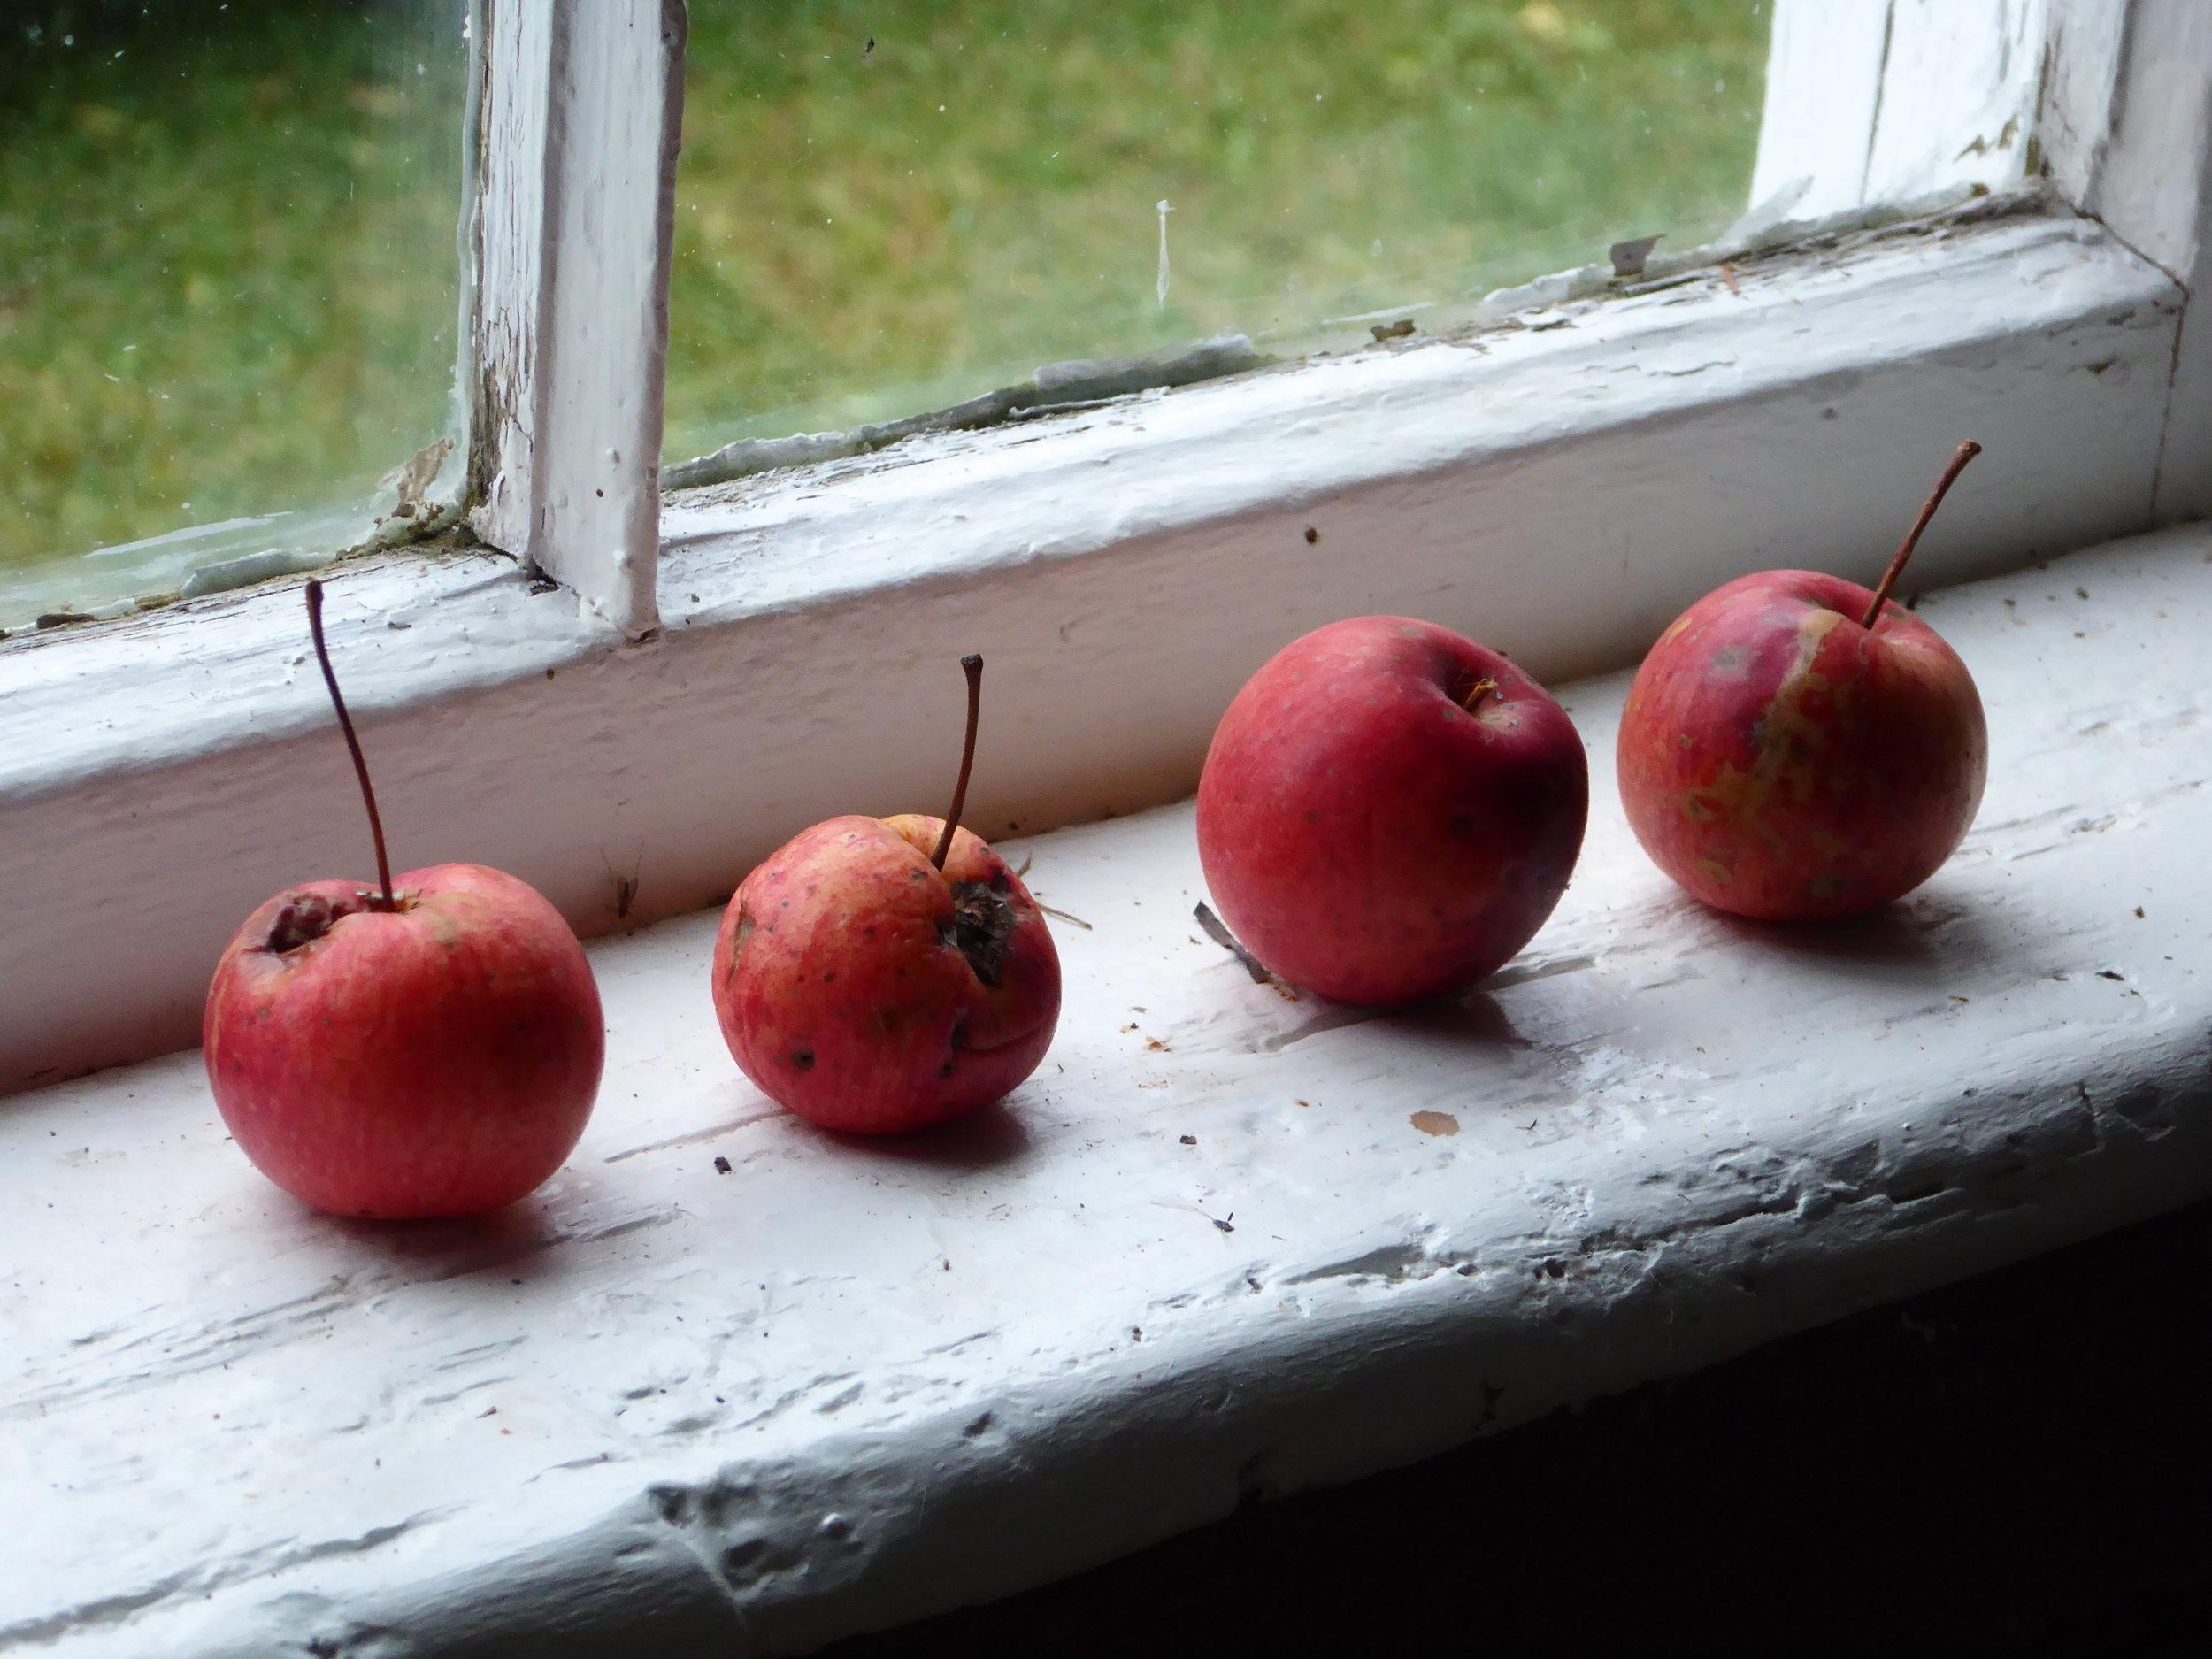 Four small apples on the windowsill of painter Thomas Joseph's midwest studio in O'Fallon, Illinois.